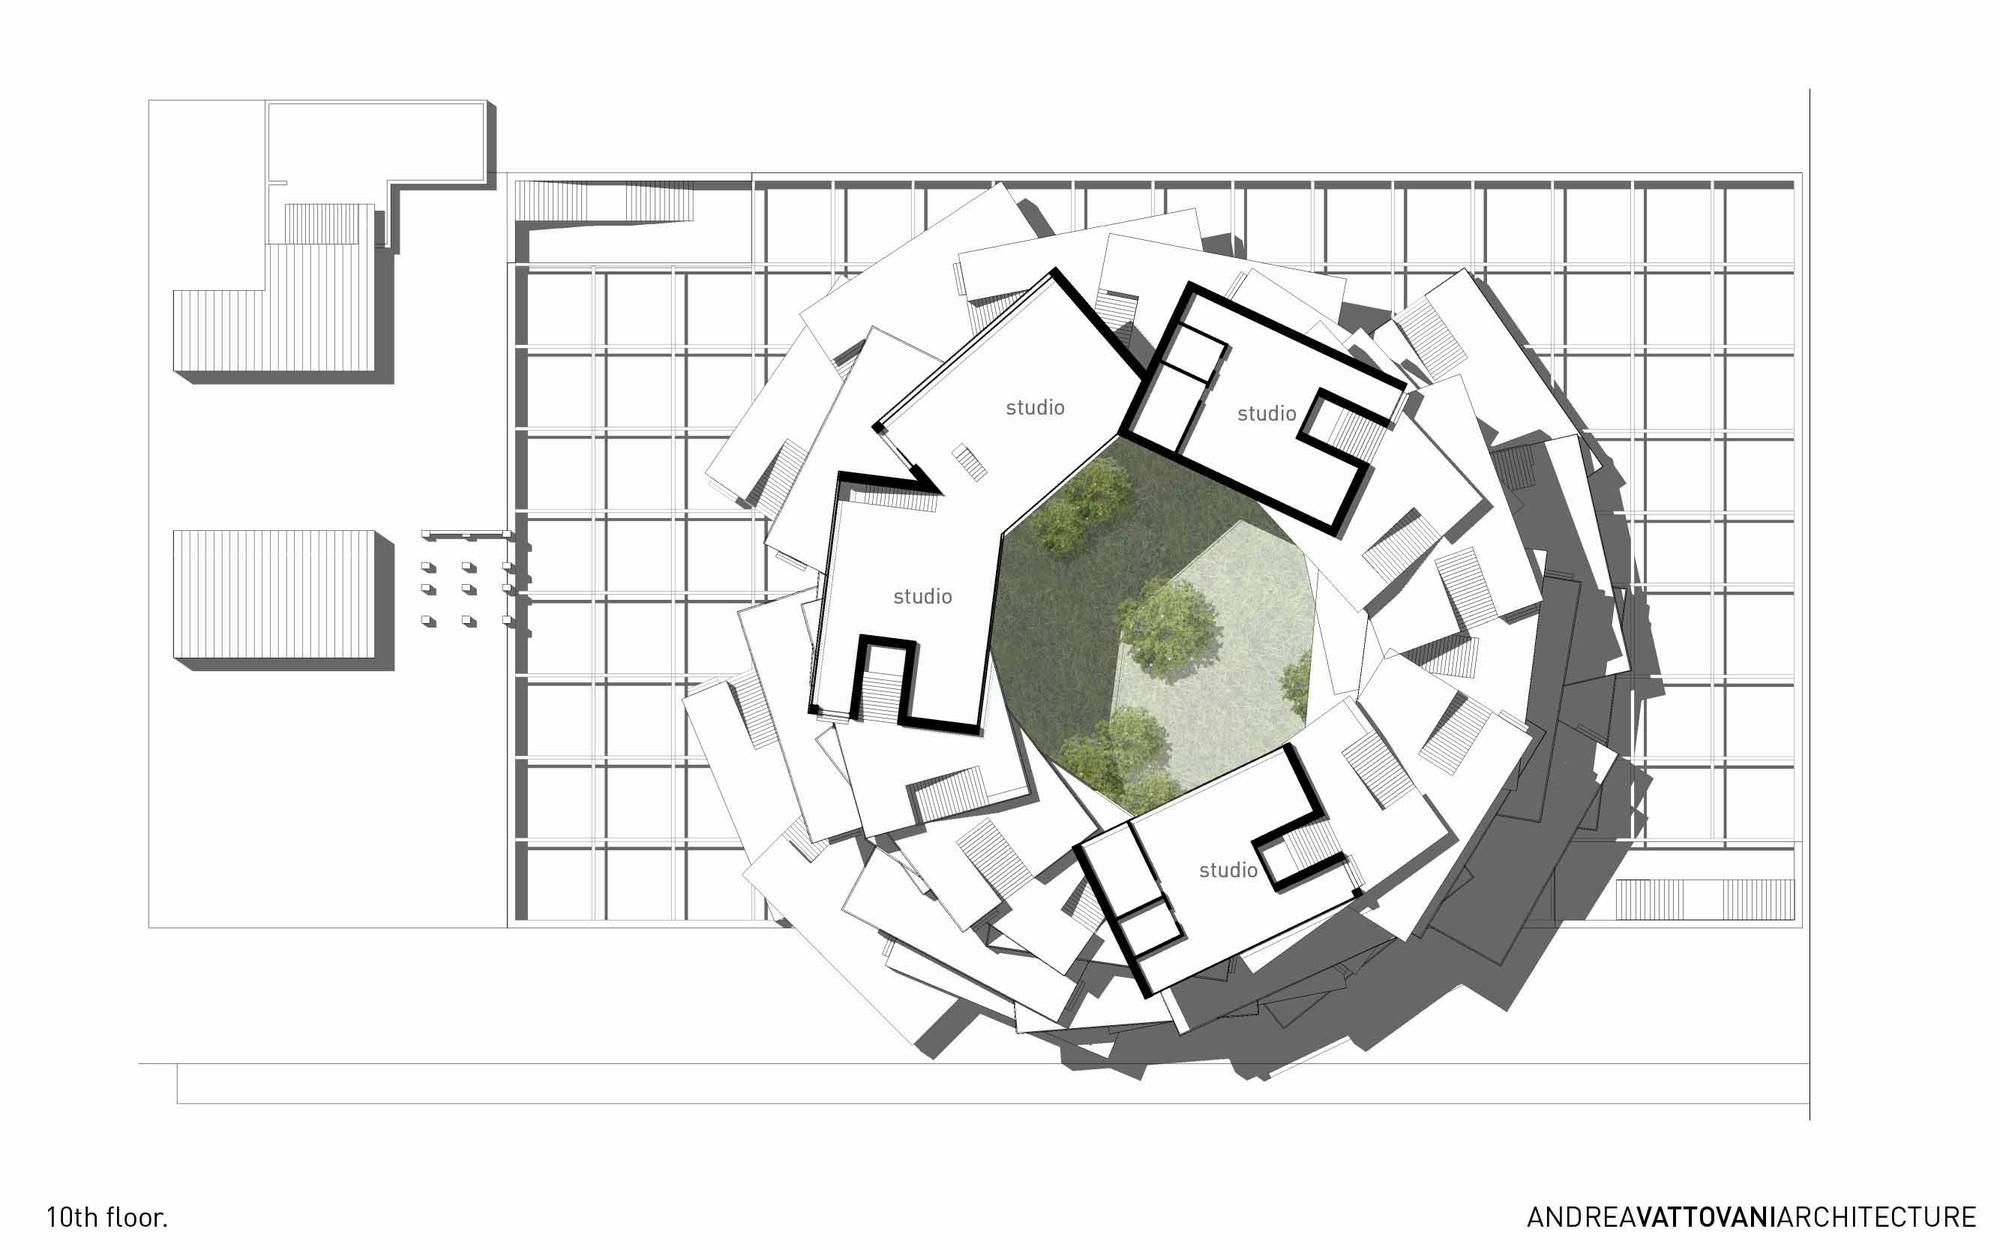 10th floor plan